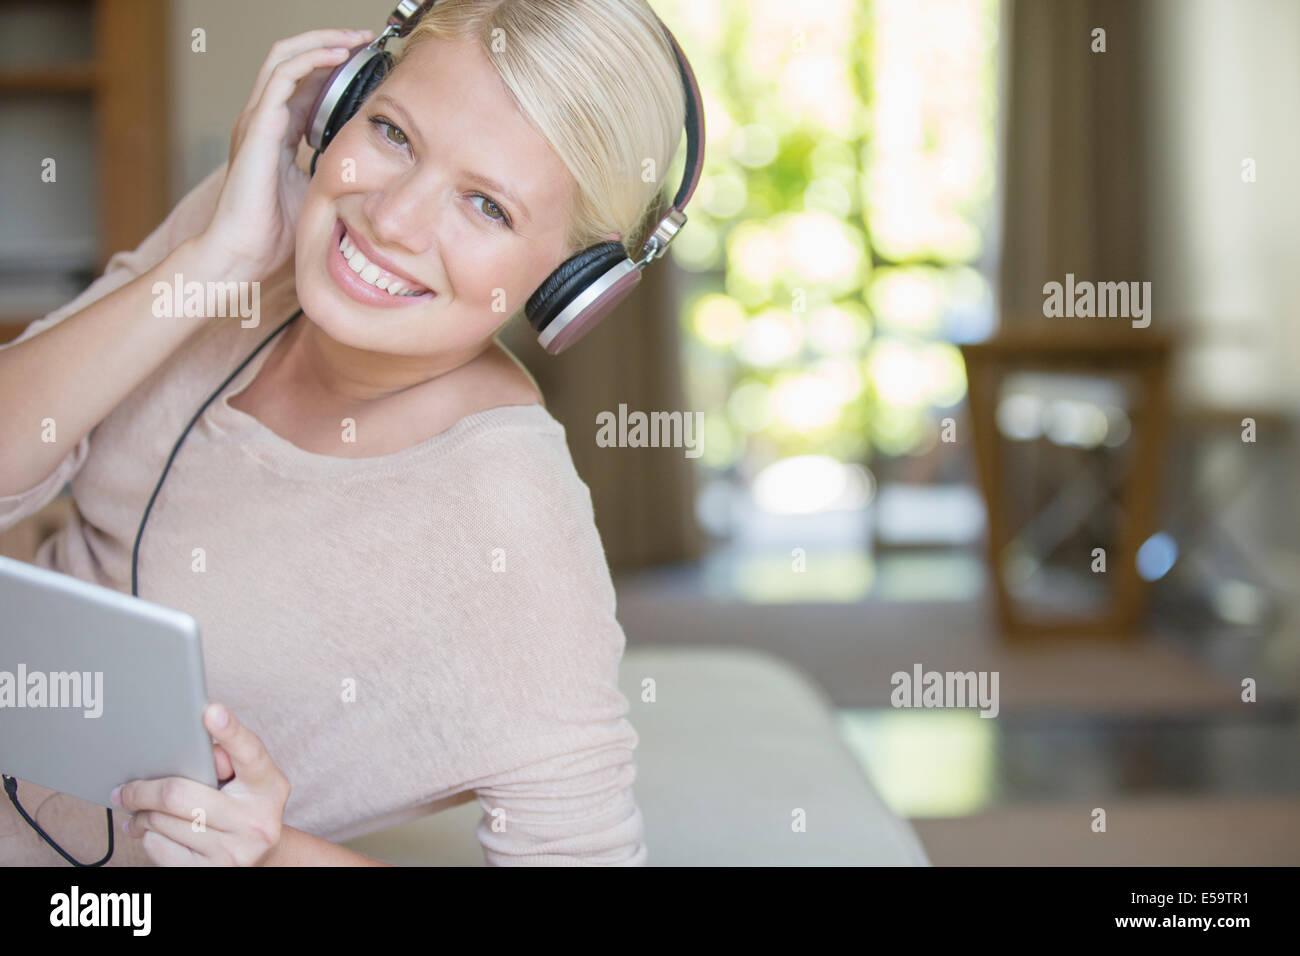 Woman using digital tablet and headphones - Stock Image